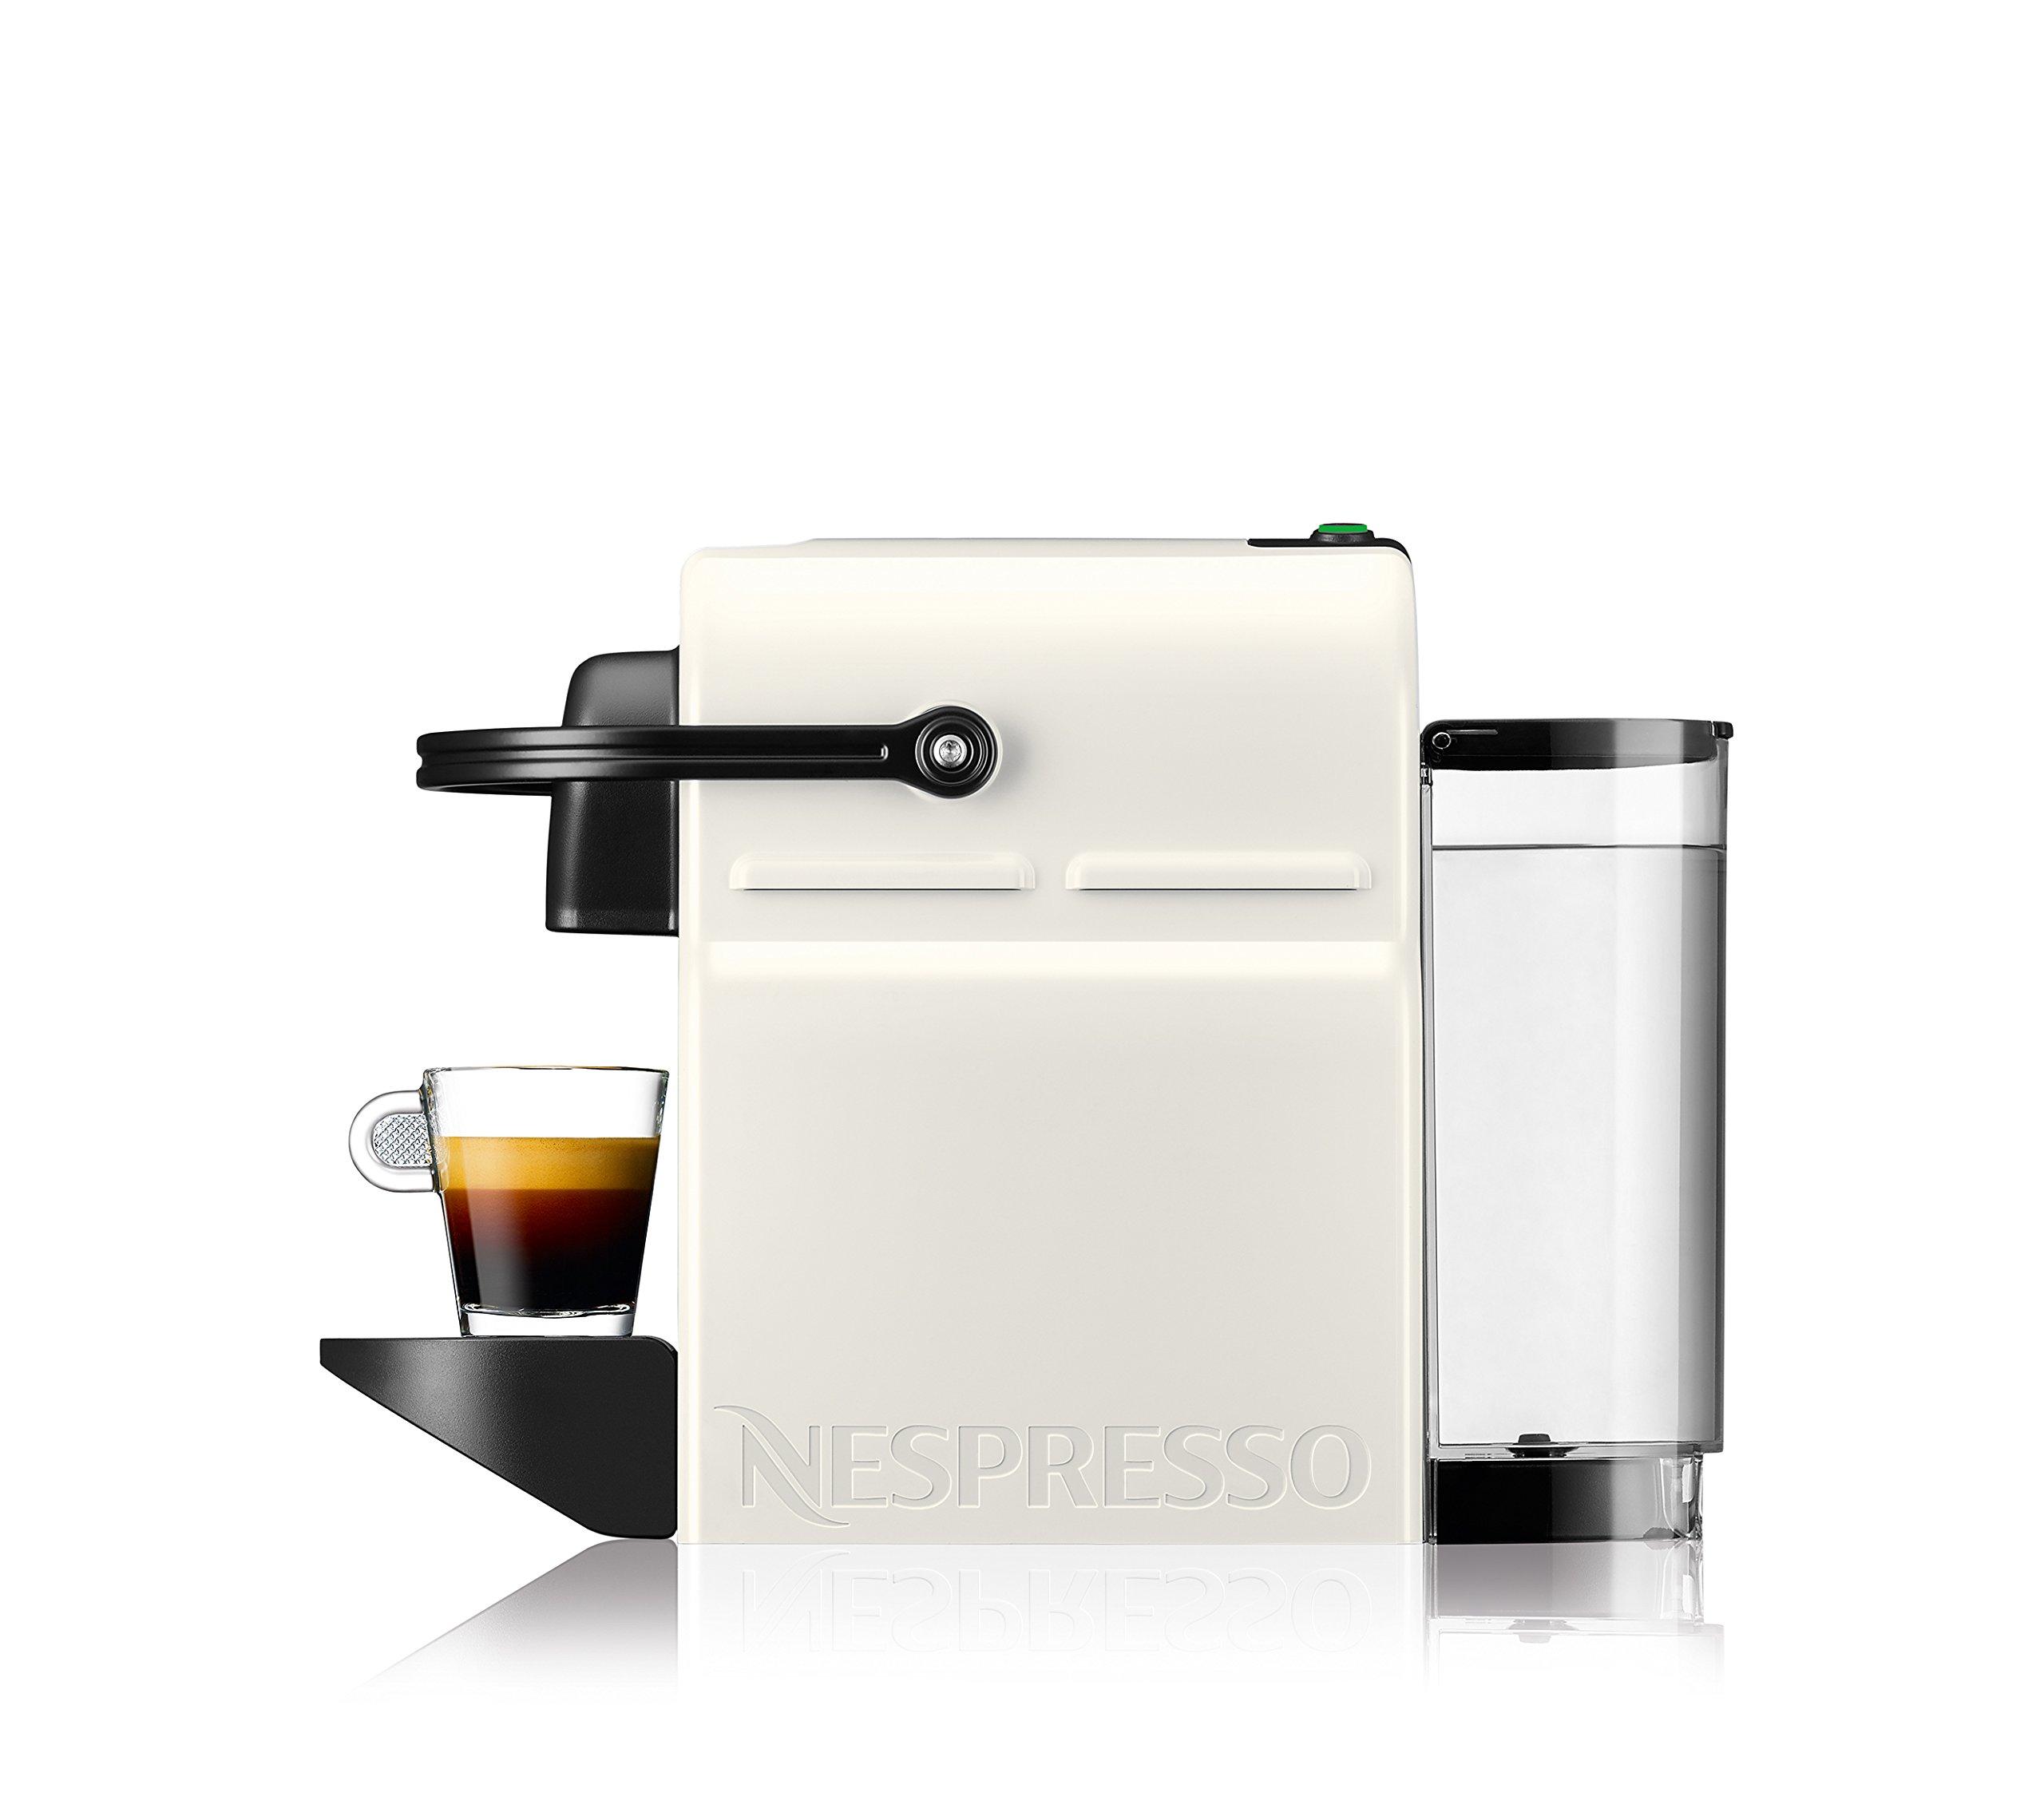 Nespresso Inissia Macchina per caffé espresso, a capsule, 1260 W, 0.7 L, Beige (Vanilla Cream) 2 spesavip